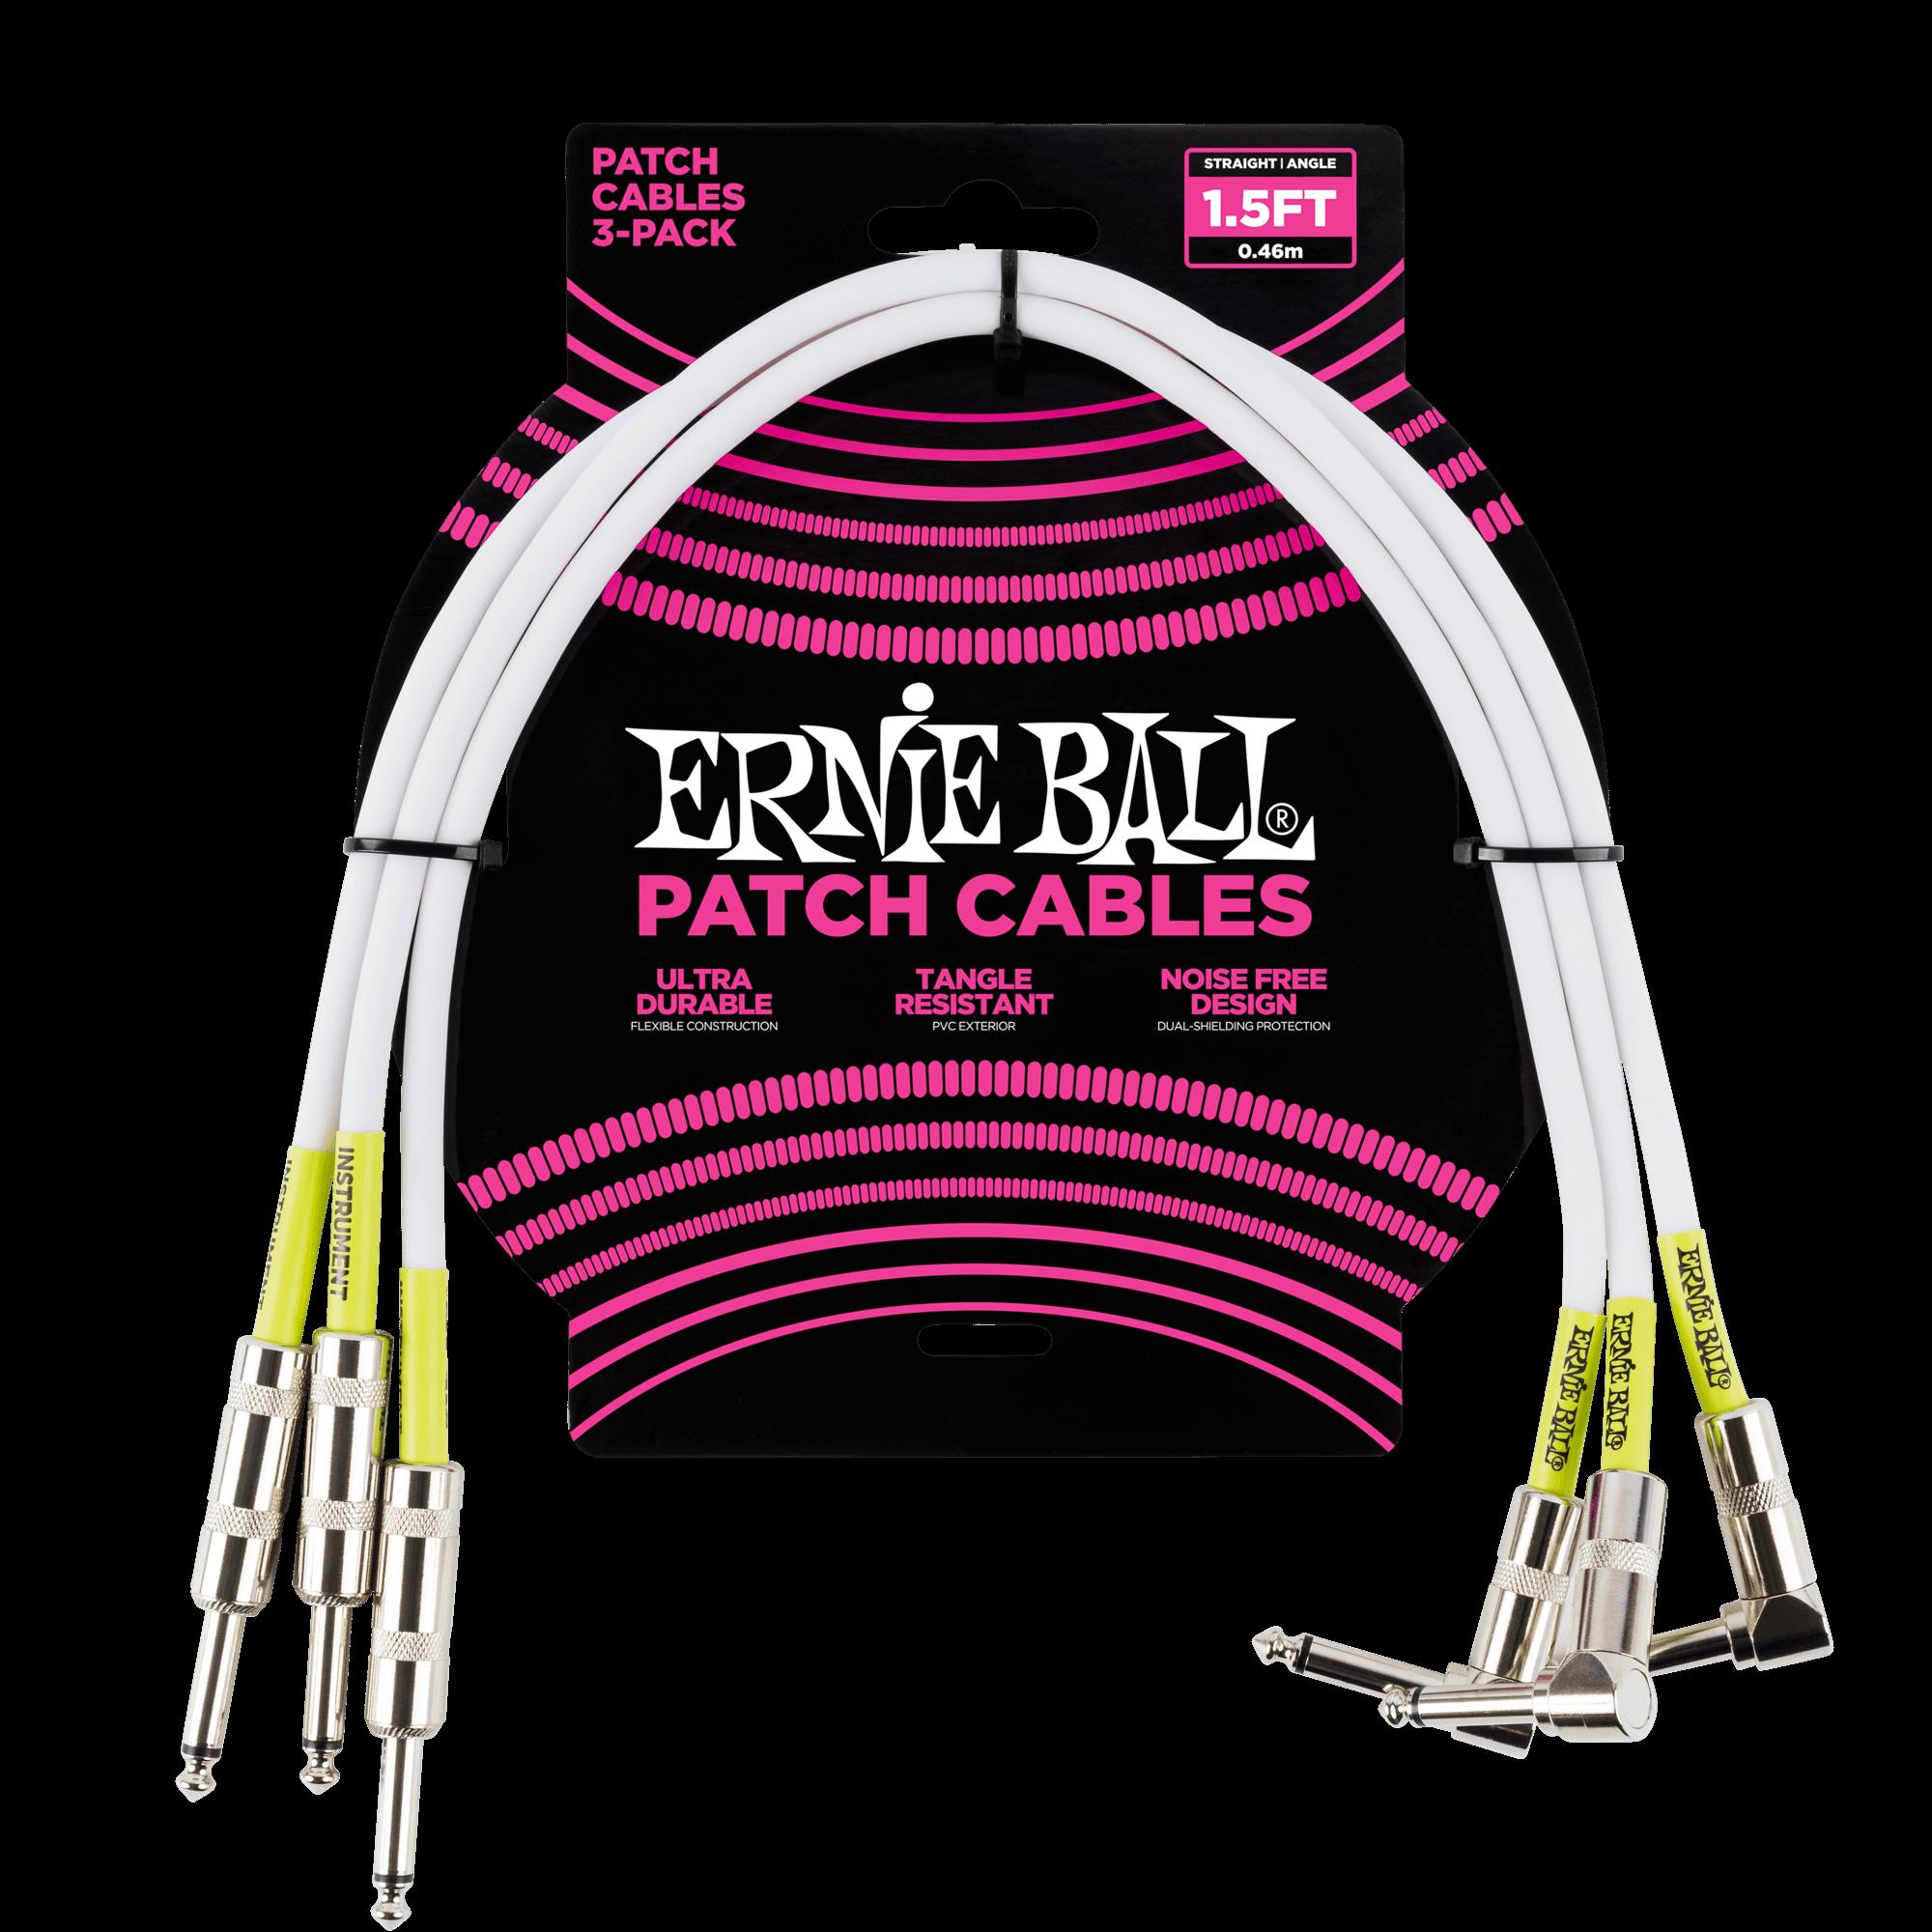 Ernie Ball 6075 Patchkabel 30 cm 3er Pack Winkelklinkenstecker PVC-Mantel Black